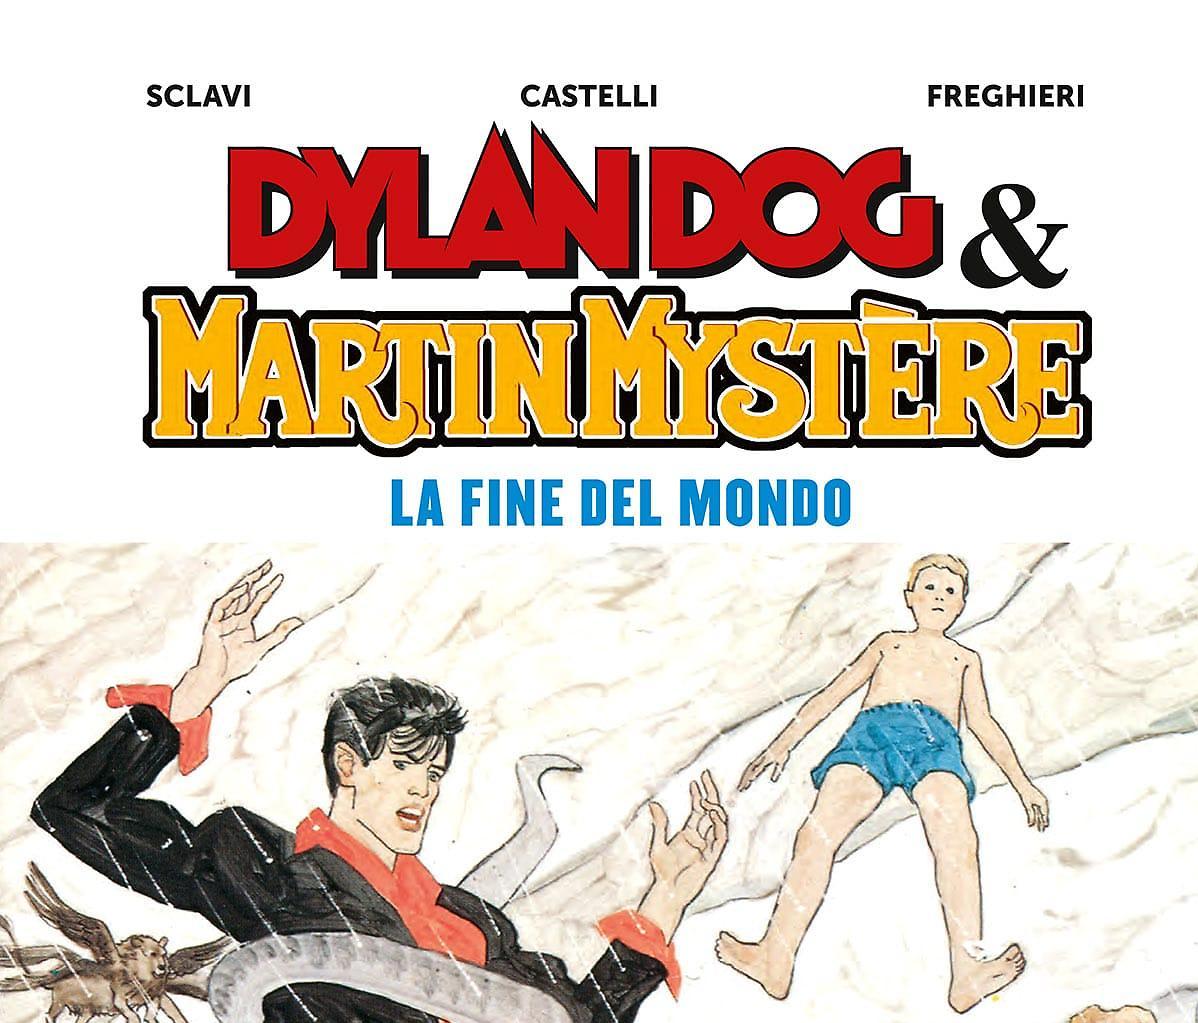 Dylan Dog Martin Mystere